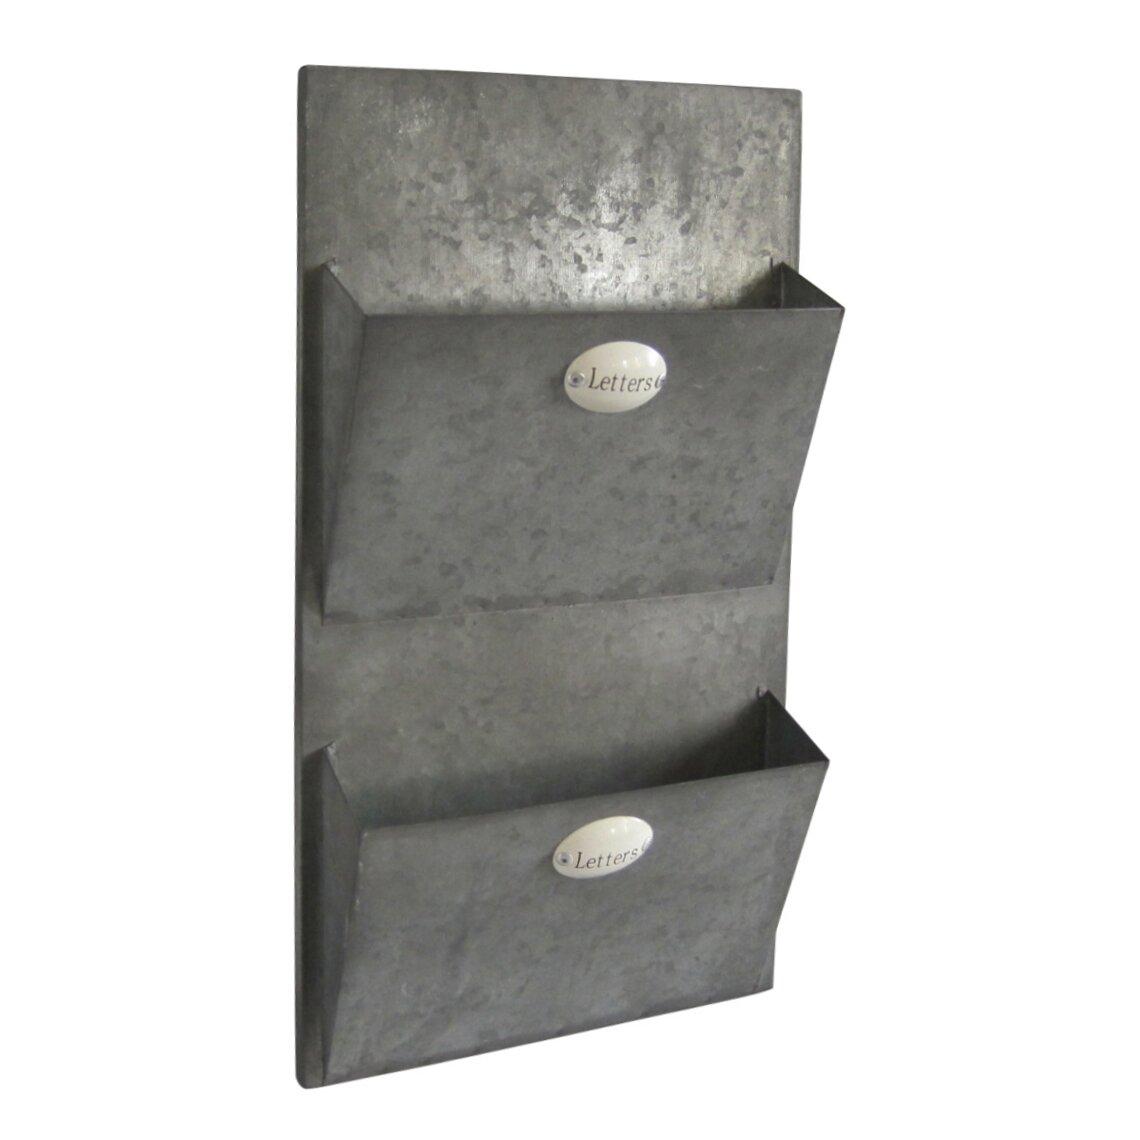 Cheungs Metal Wall Mail Holder Amp Reviews Wayfair